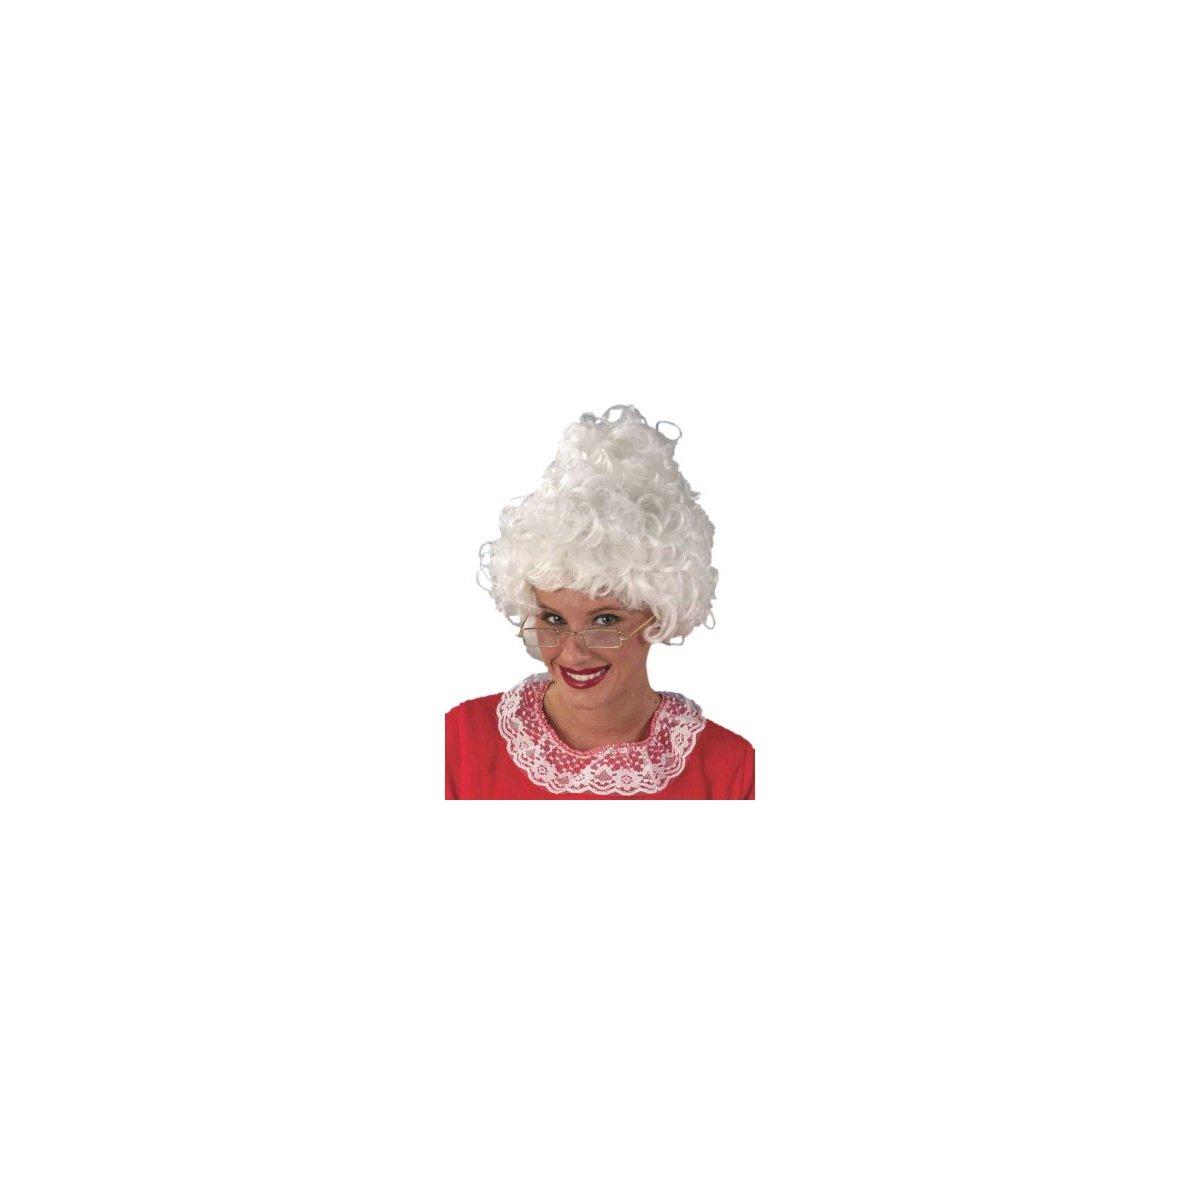 Mrs. Santa Wig Costume Accessory